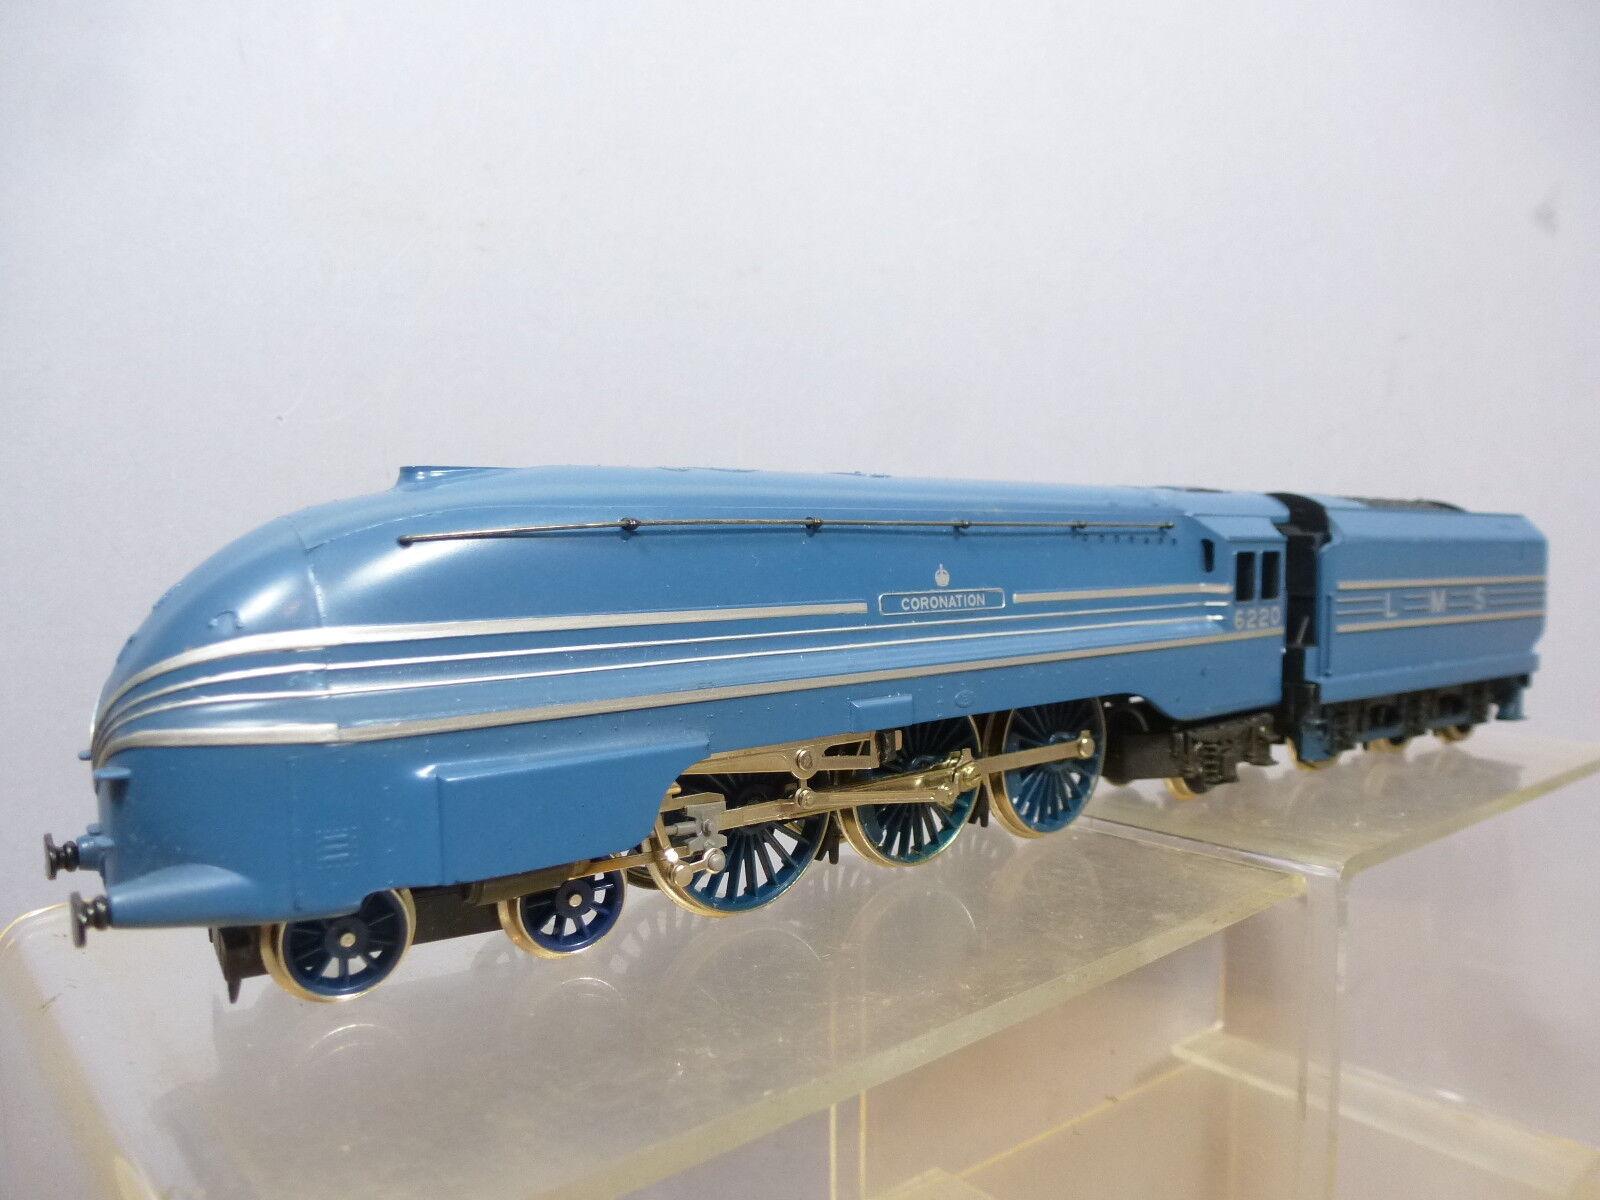 HORNBY  RAILWAYS MODEL No.R685  LMS 7P 4-6-2   CgoldNATION  LOCO & TENDER